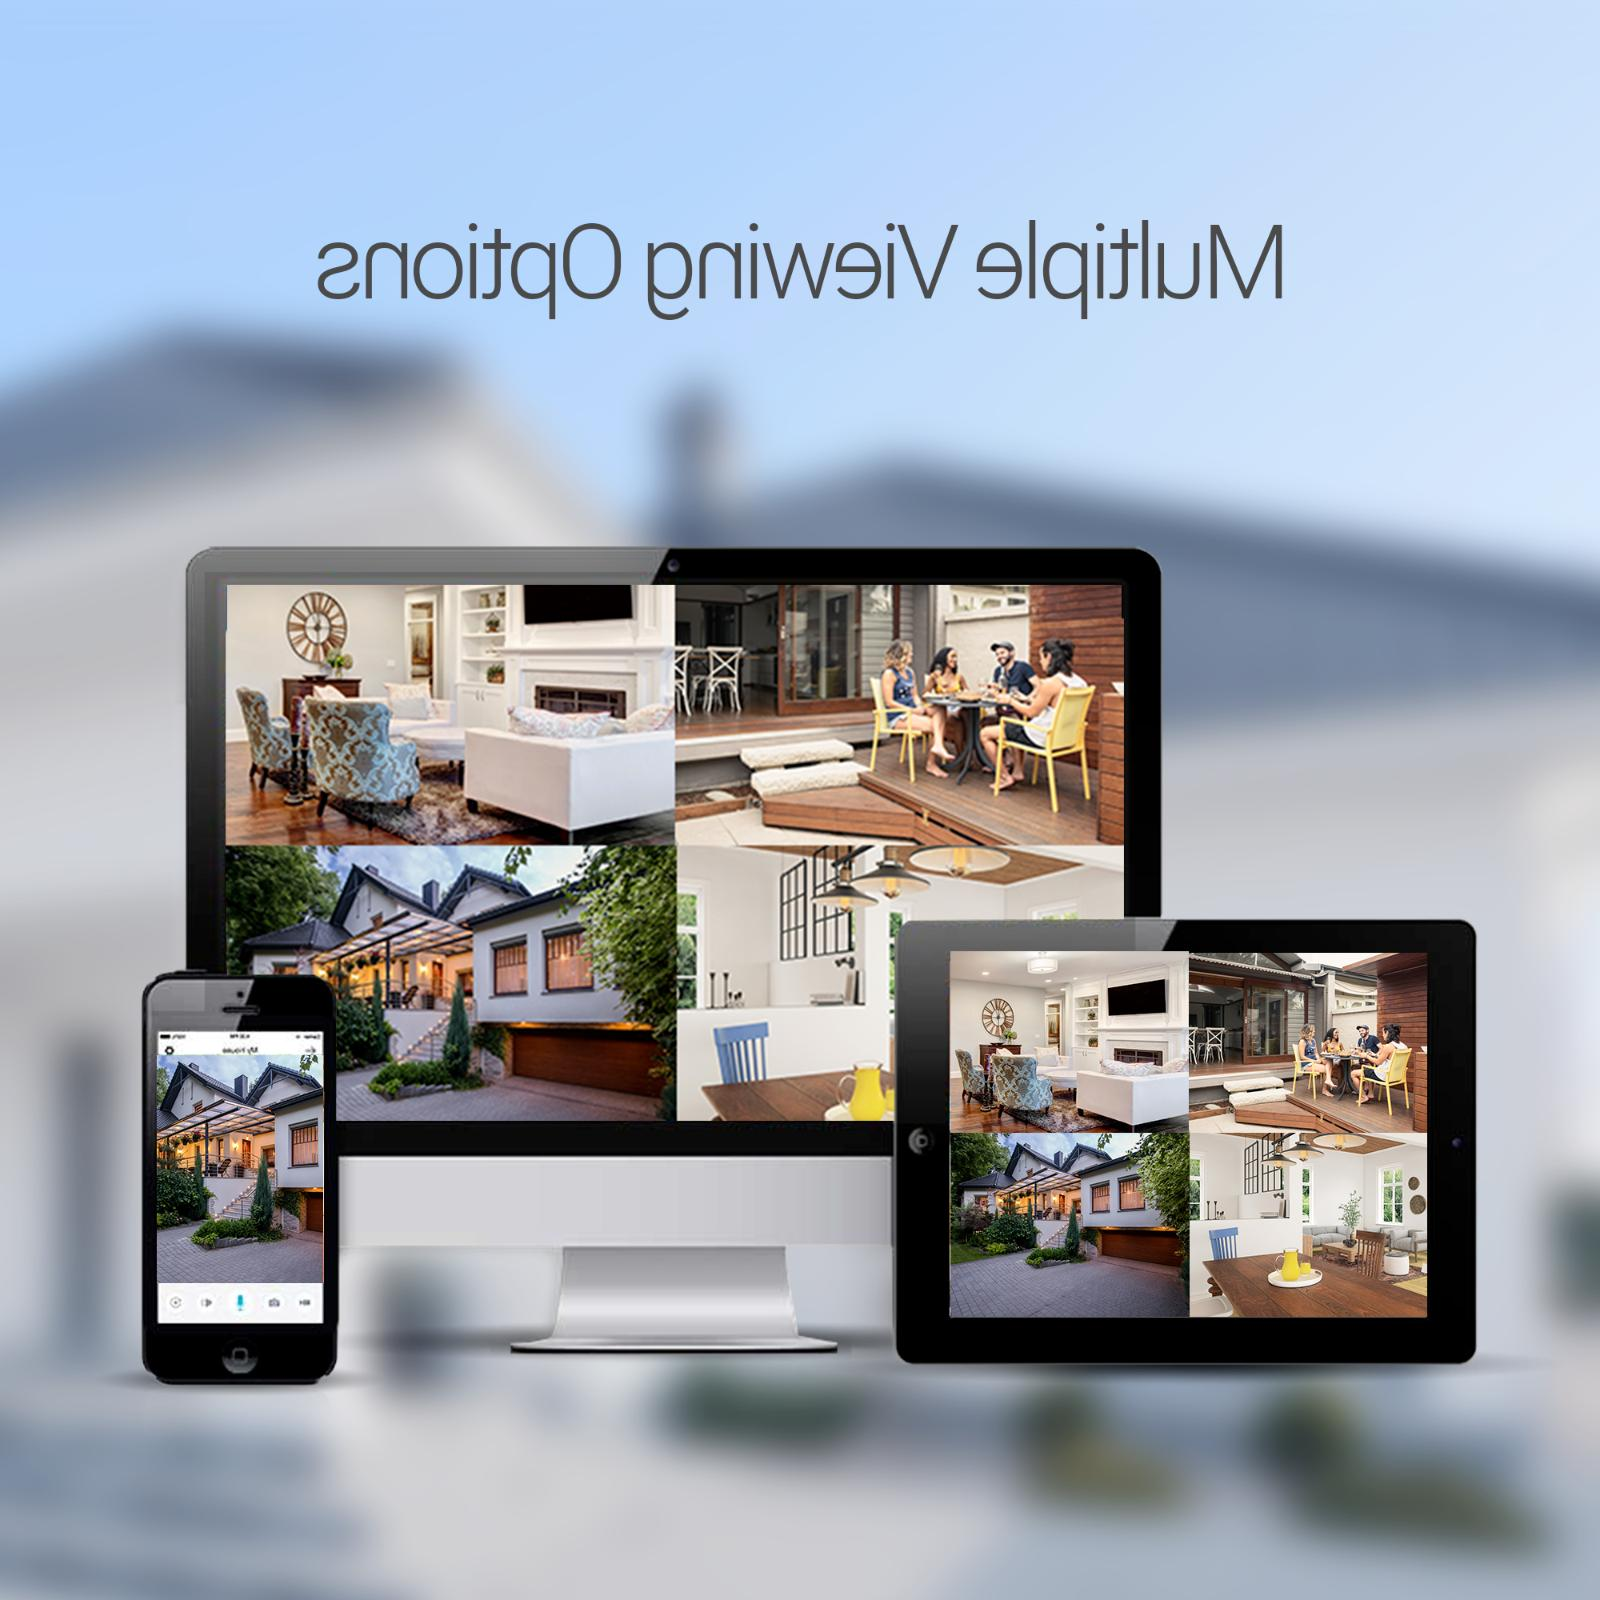 Zmodo 1080p Security IP Camera Indoor Outdoor